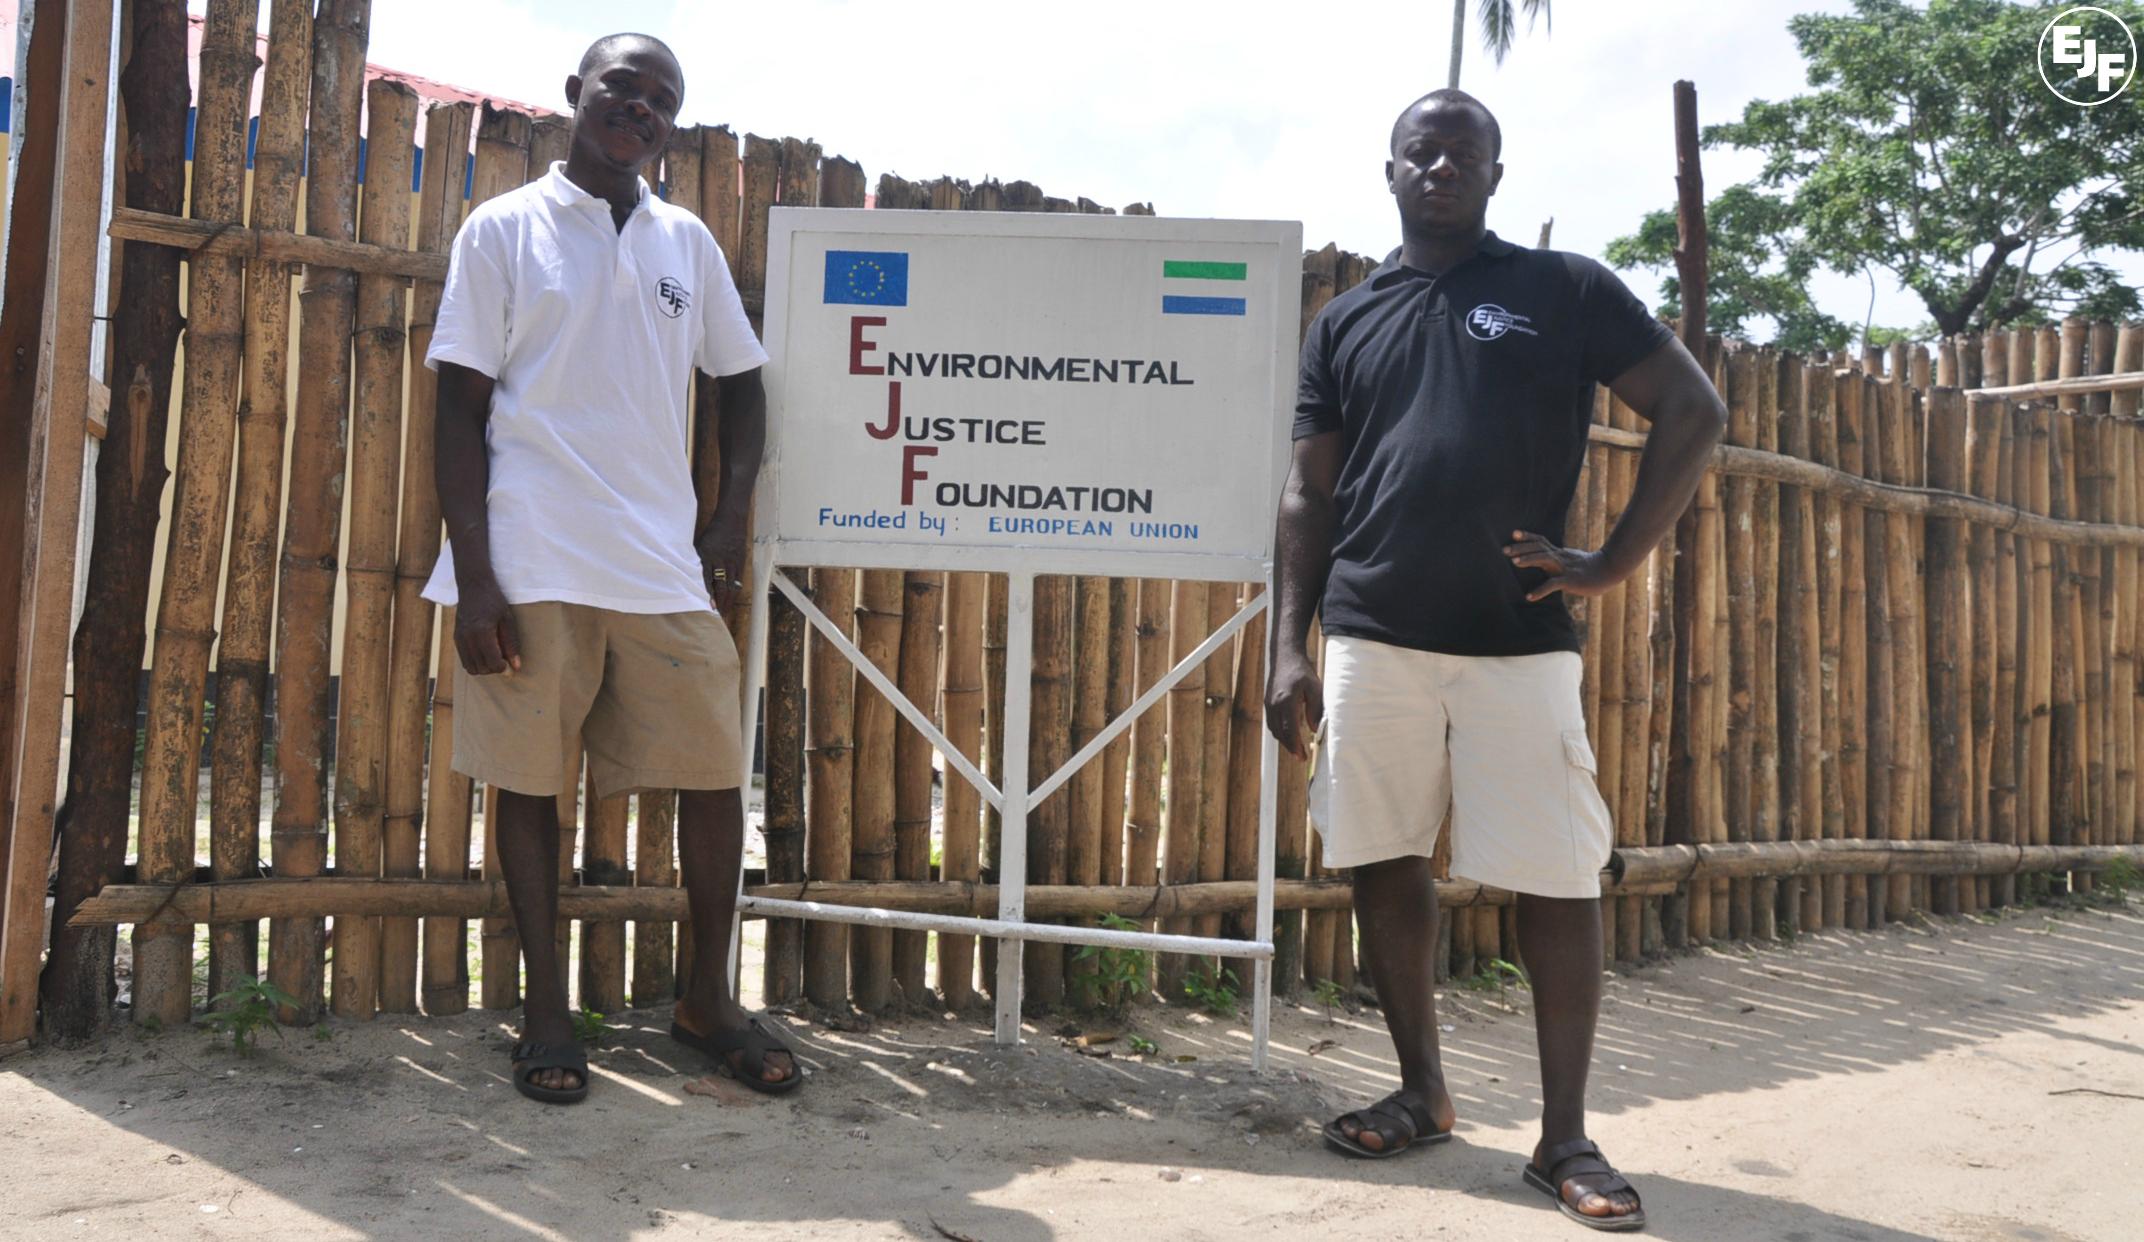 Ceremony held to open new EJF office in Bonthe, Sierra Leone